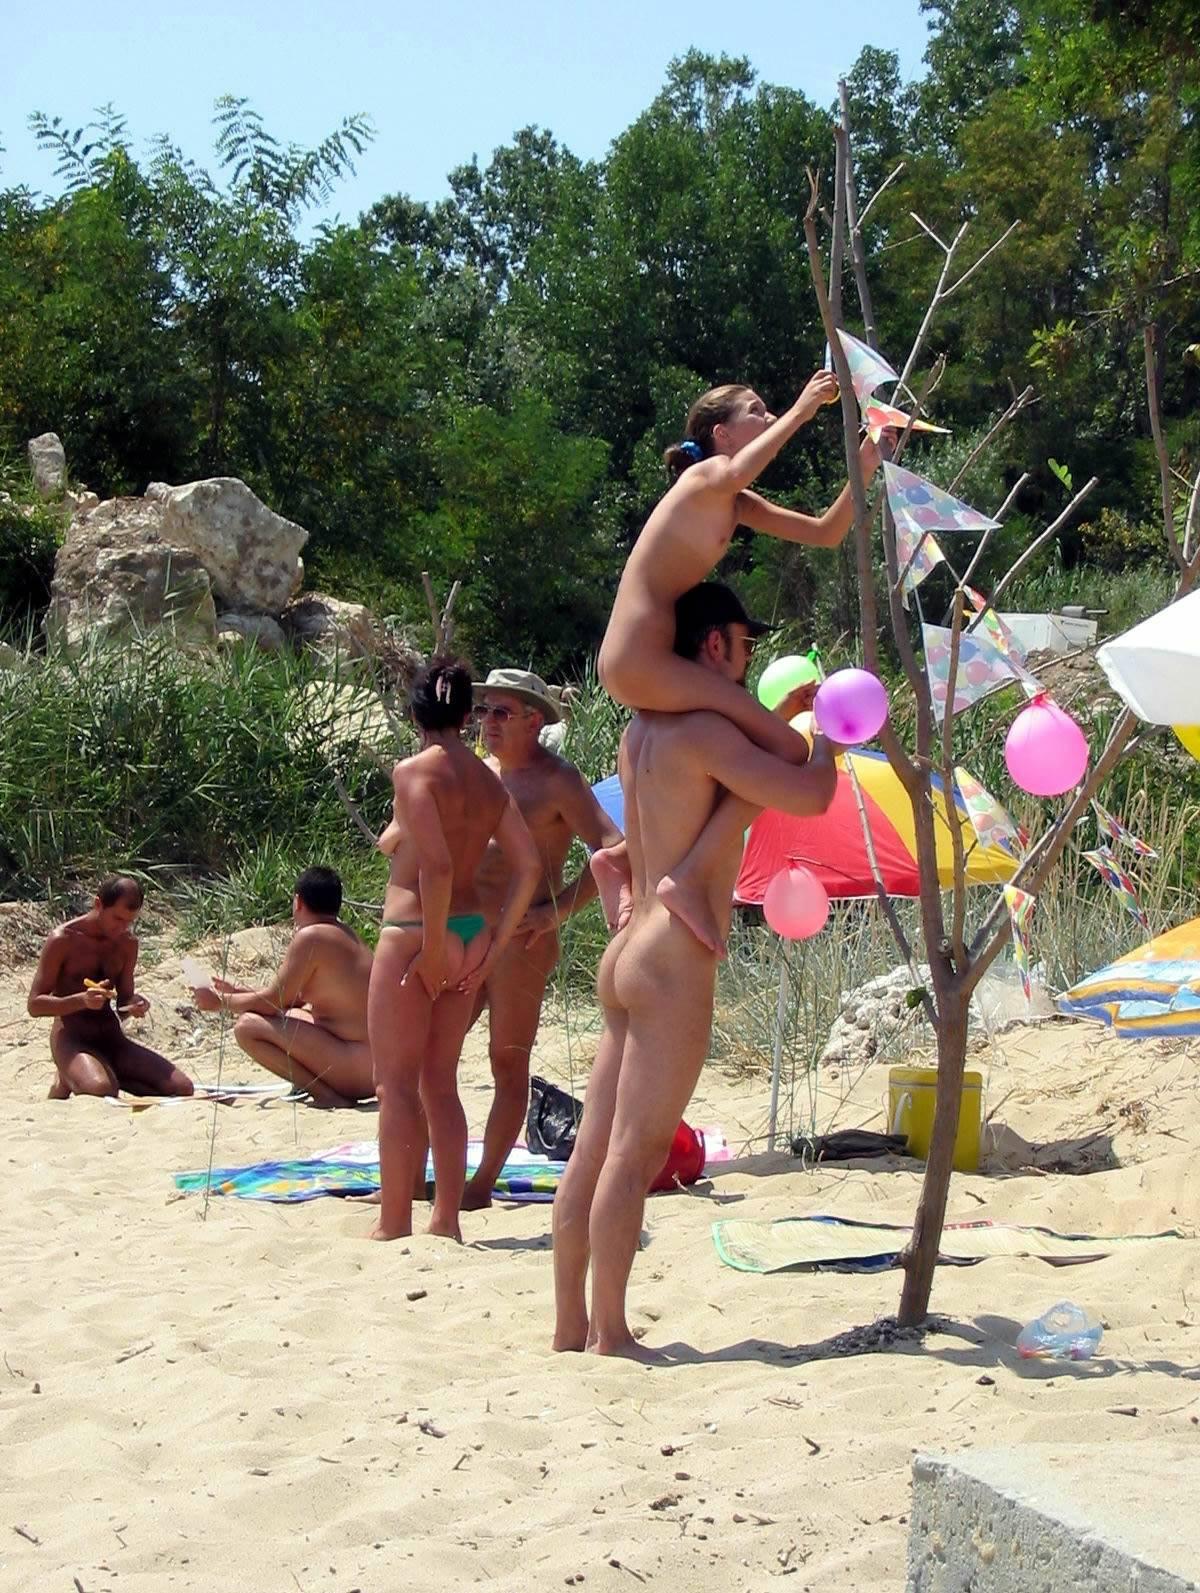 Bulgarian Nude Day Preps - 2